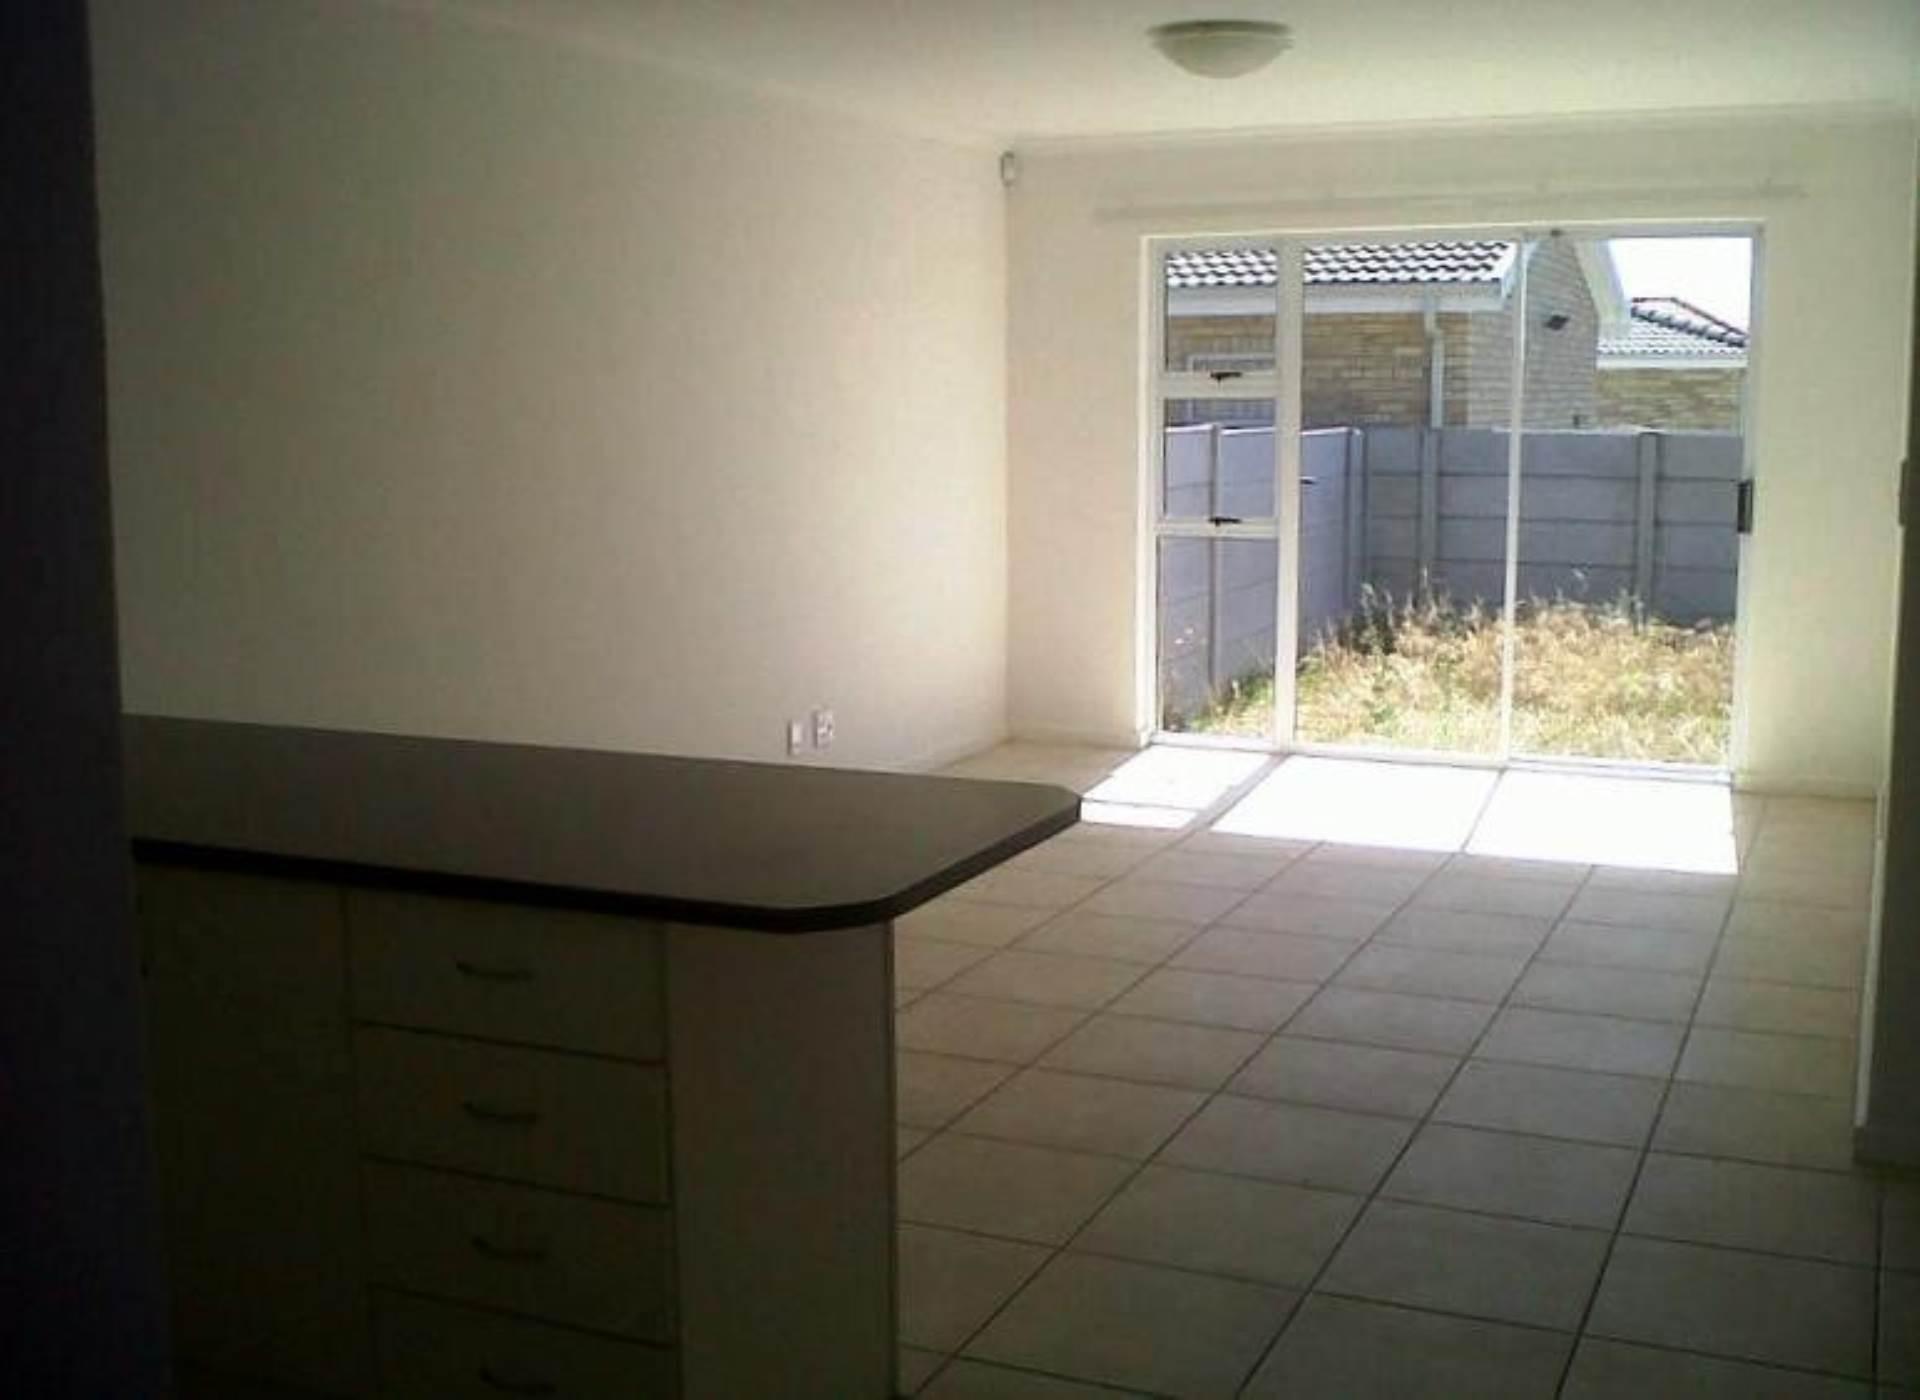 2 BedroomHouse To Rent In Summerville